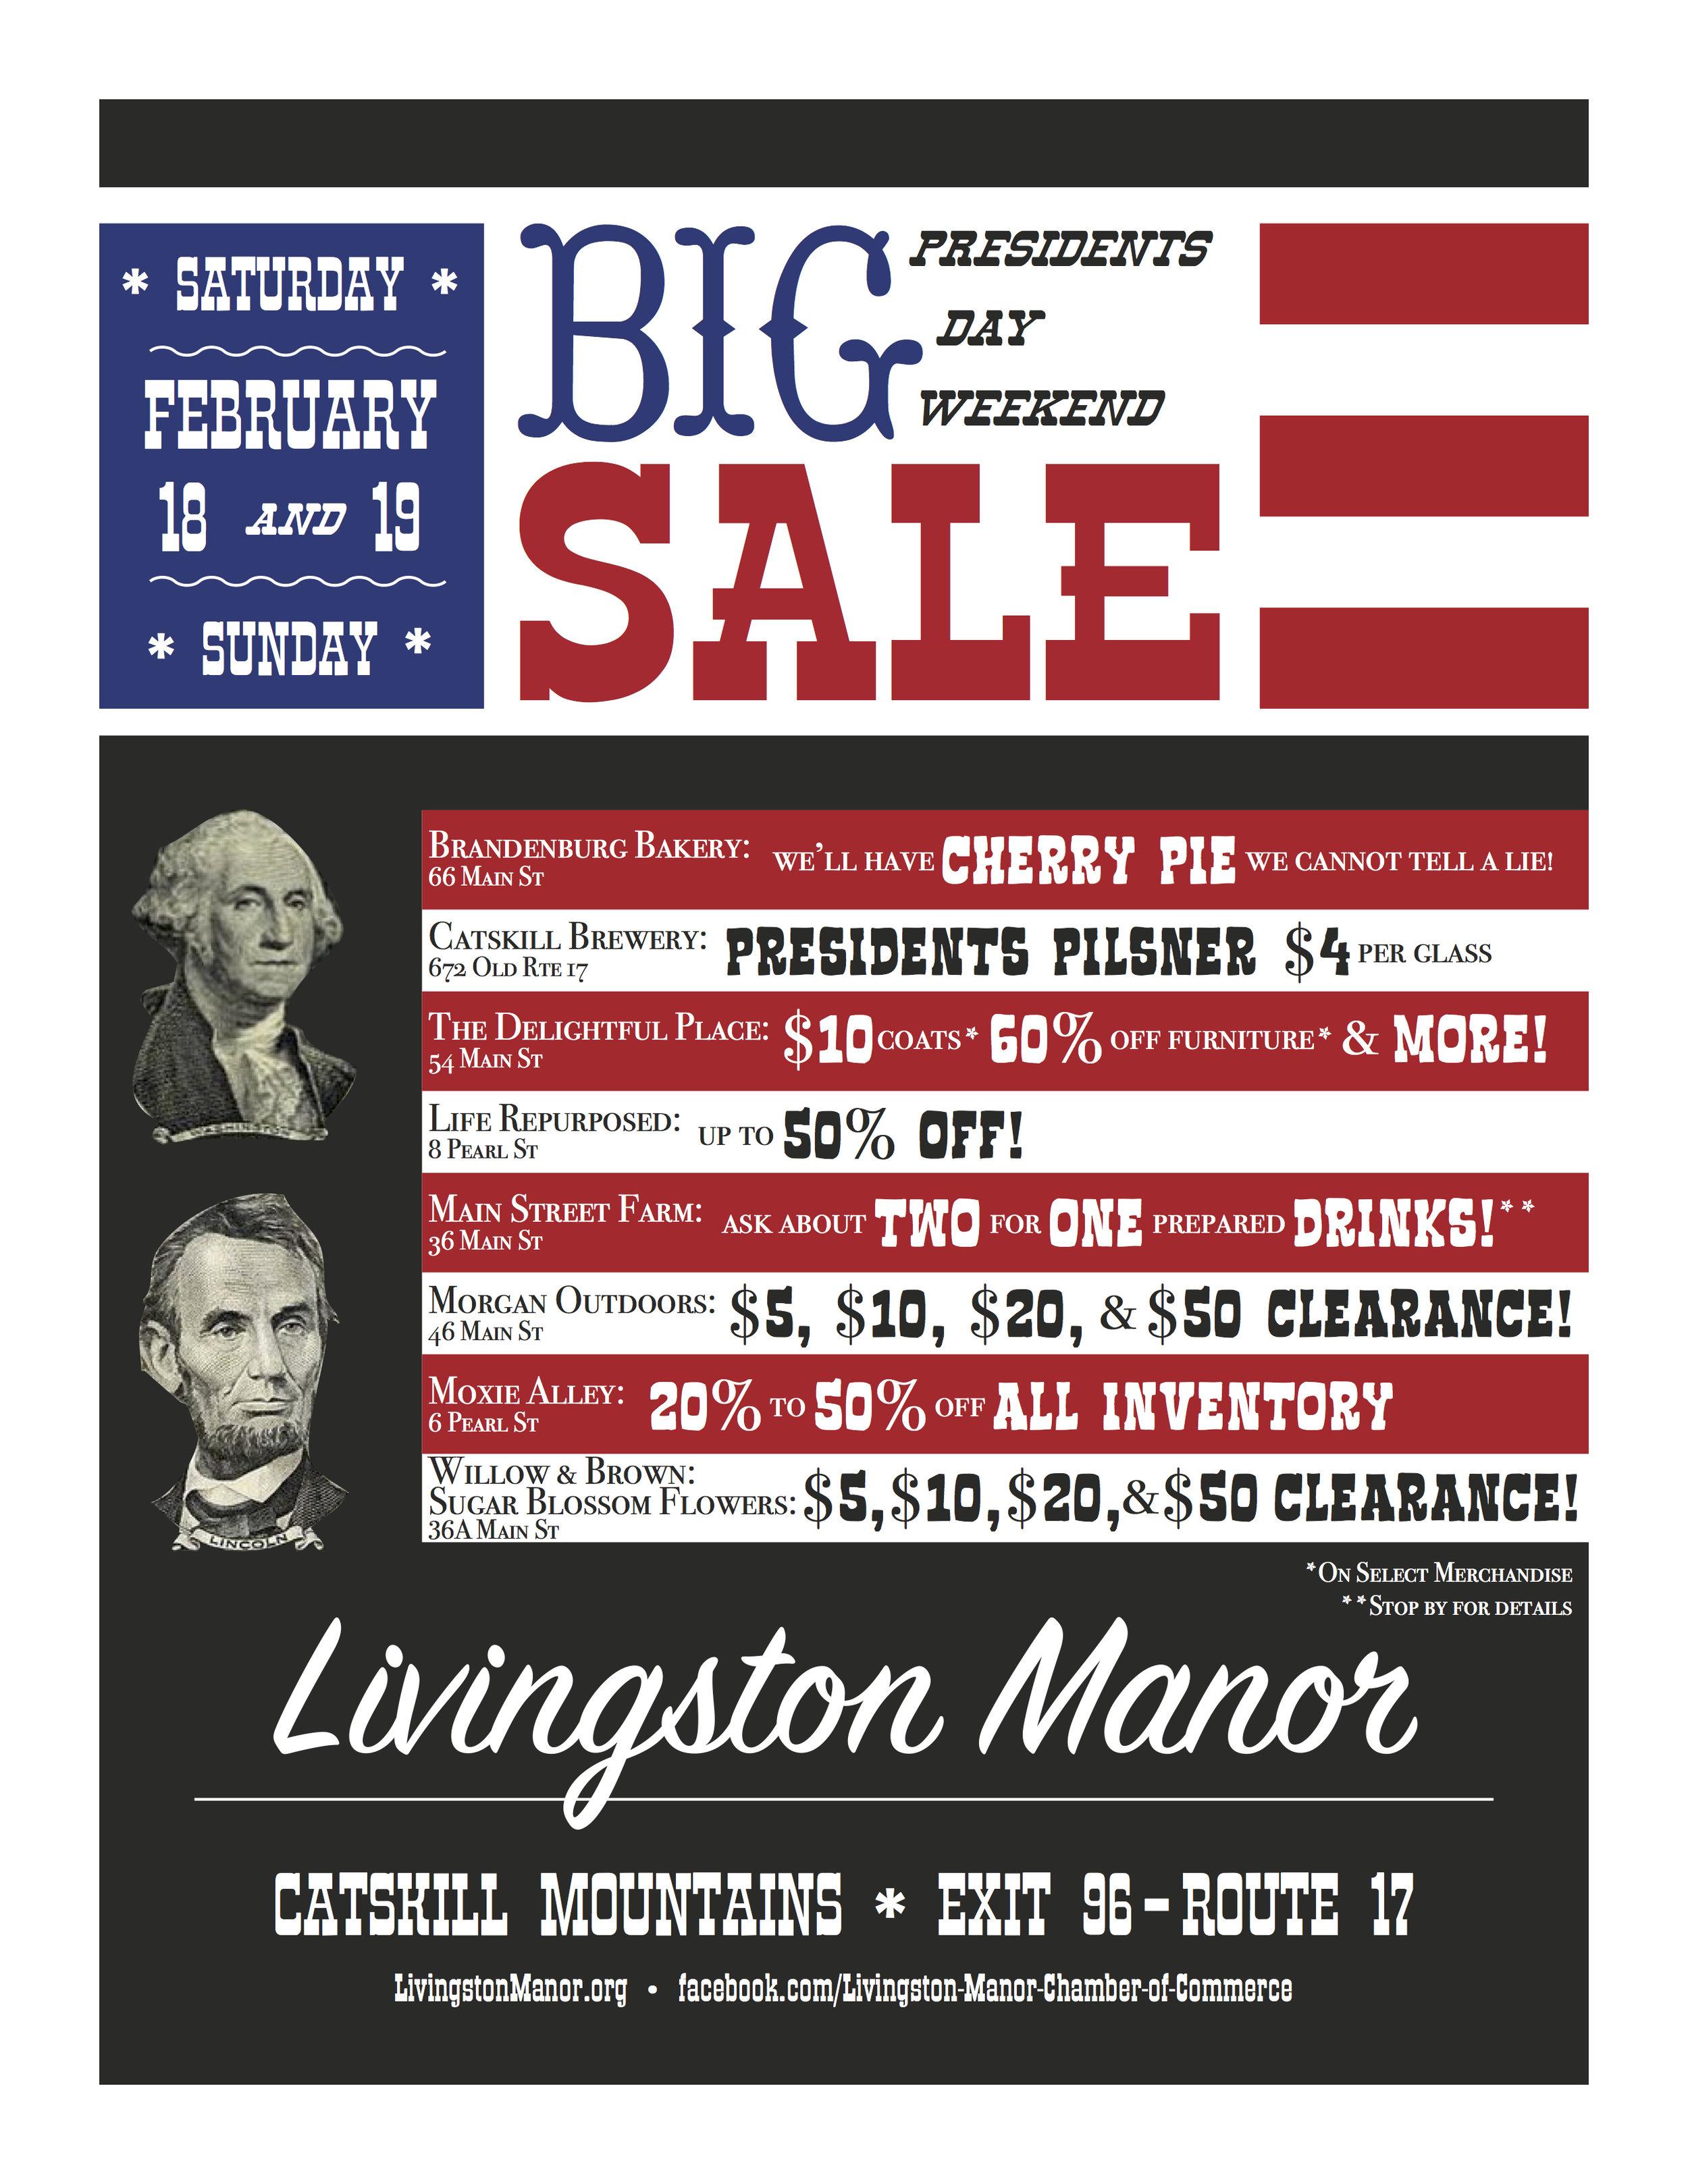 Presidents Day Weekend Big Sale